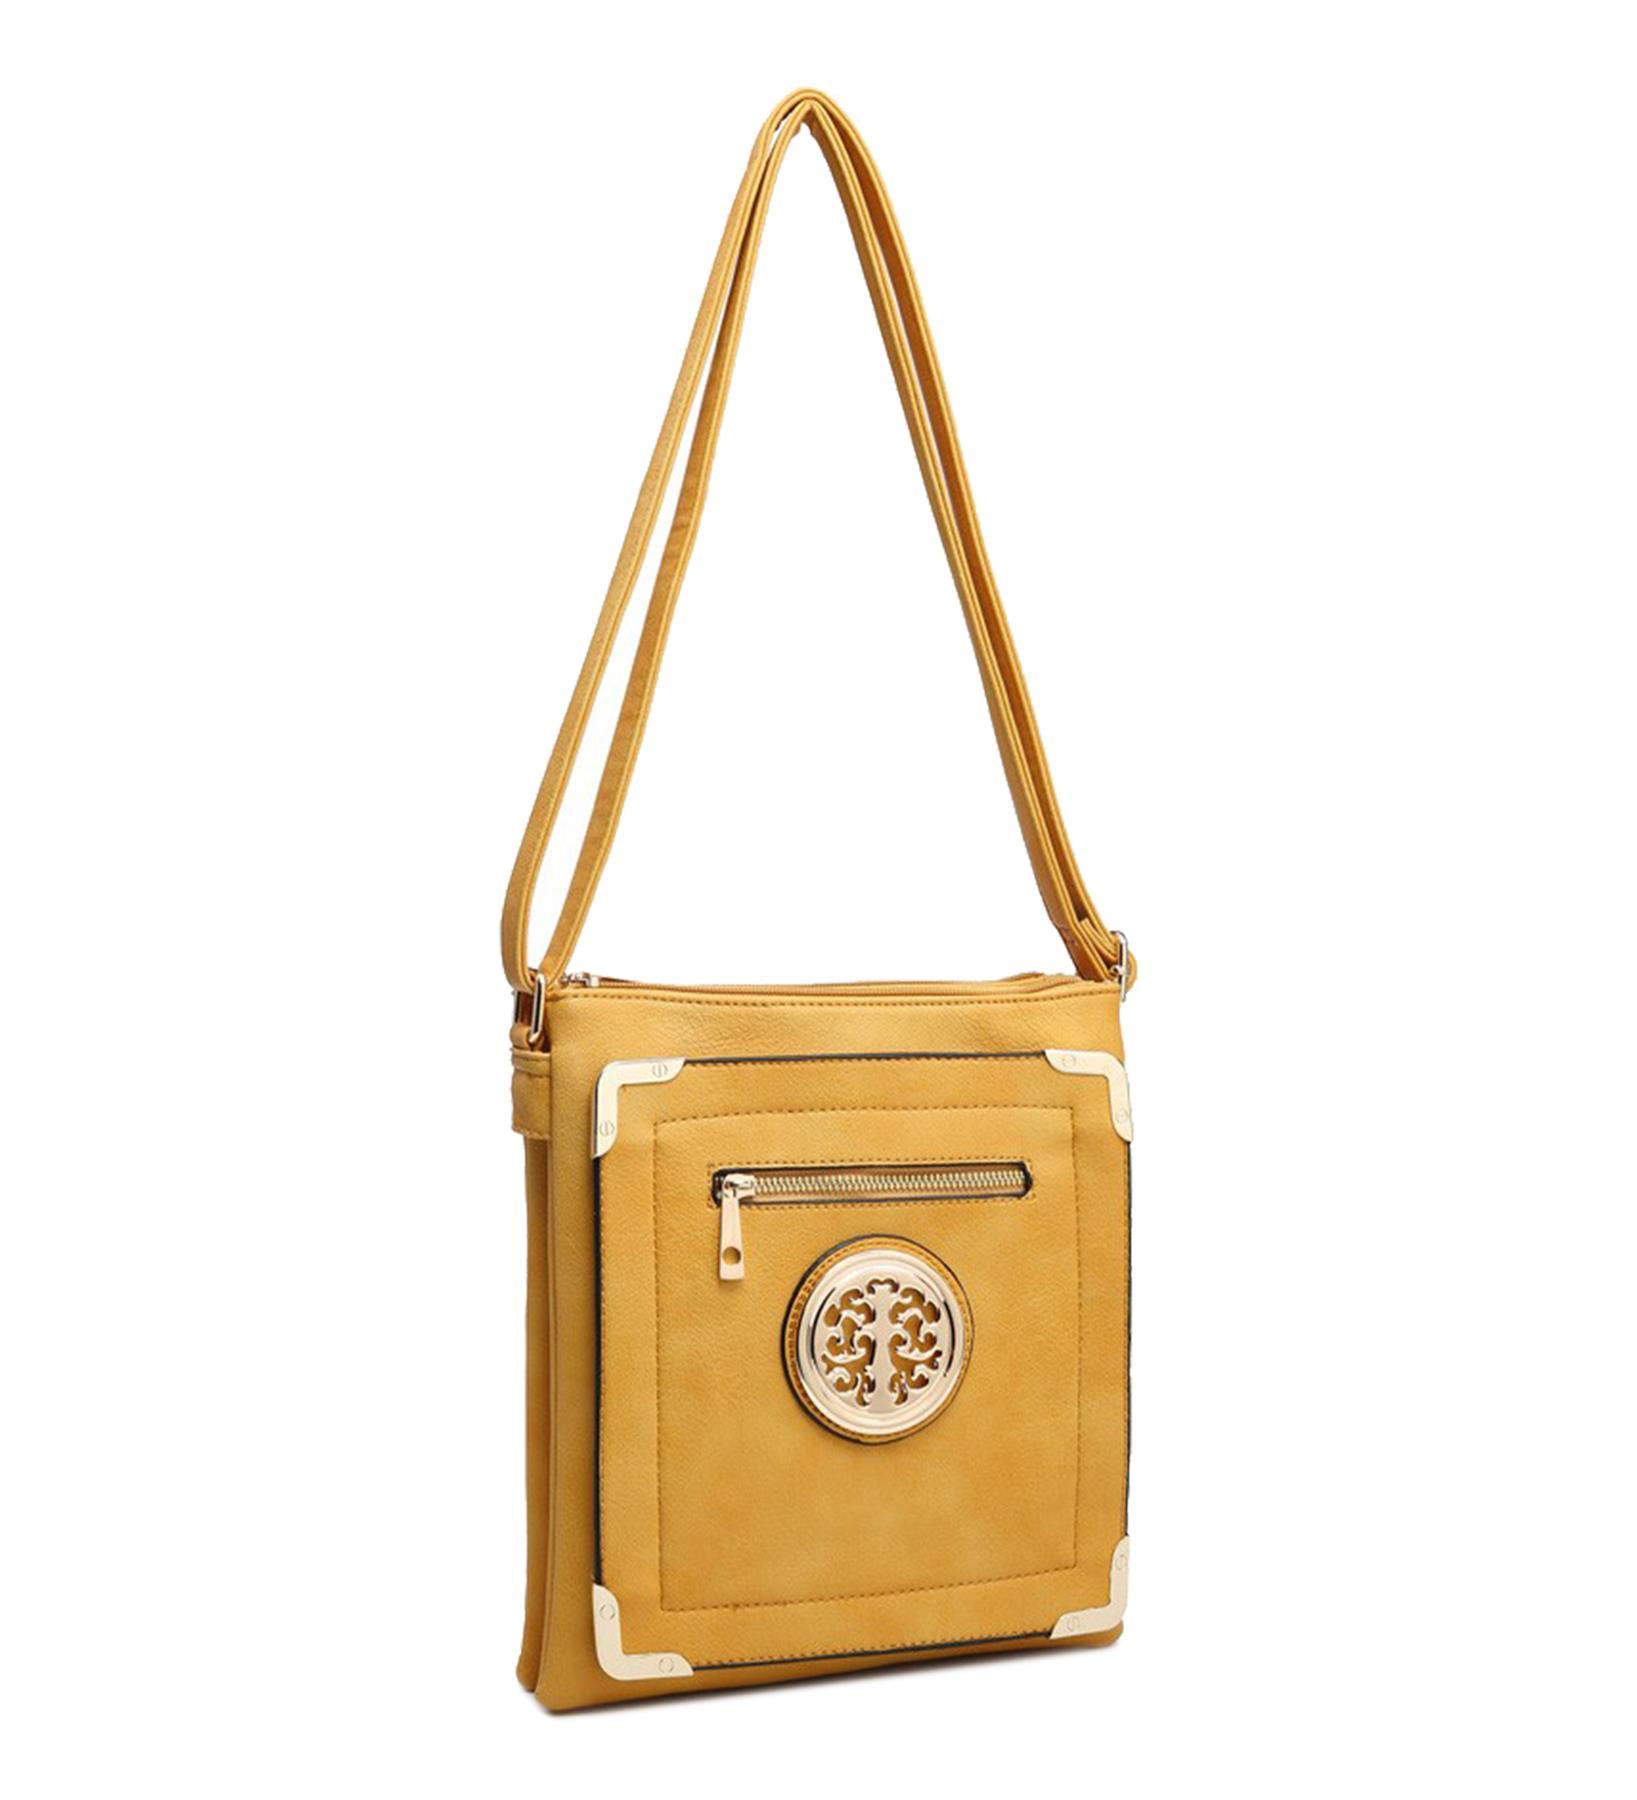 New-Casual-Ladies-Multi-Pocket-Metallic-Detail-Adjustable-Crossbody-Bag thumbnail 11